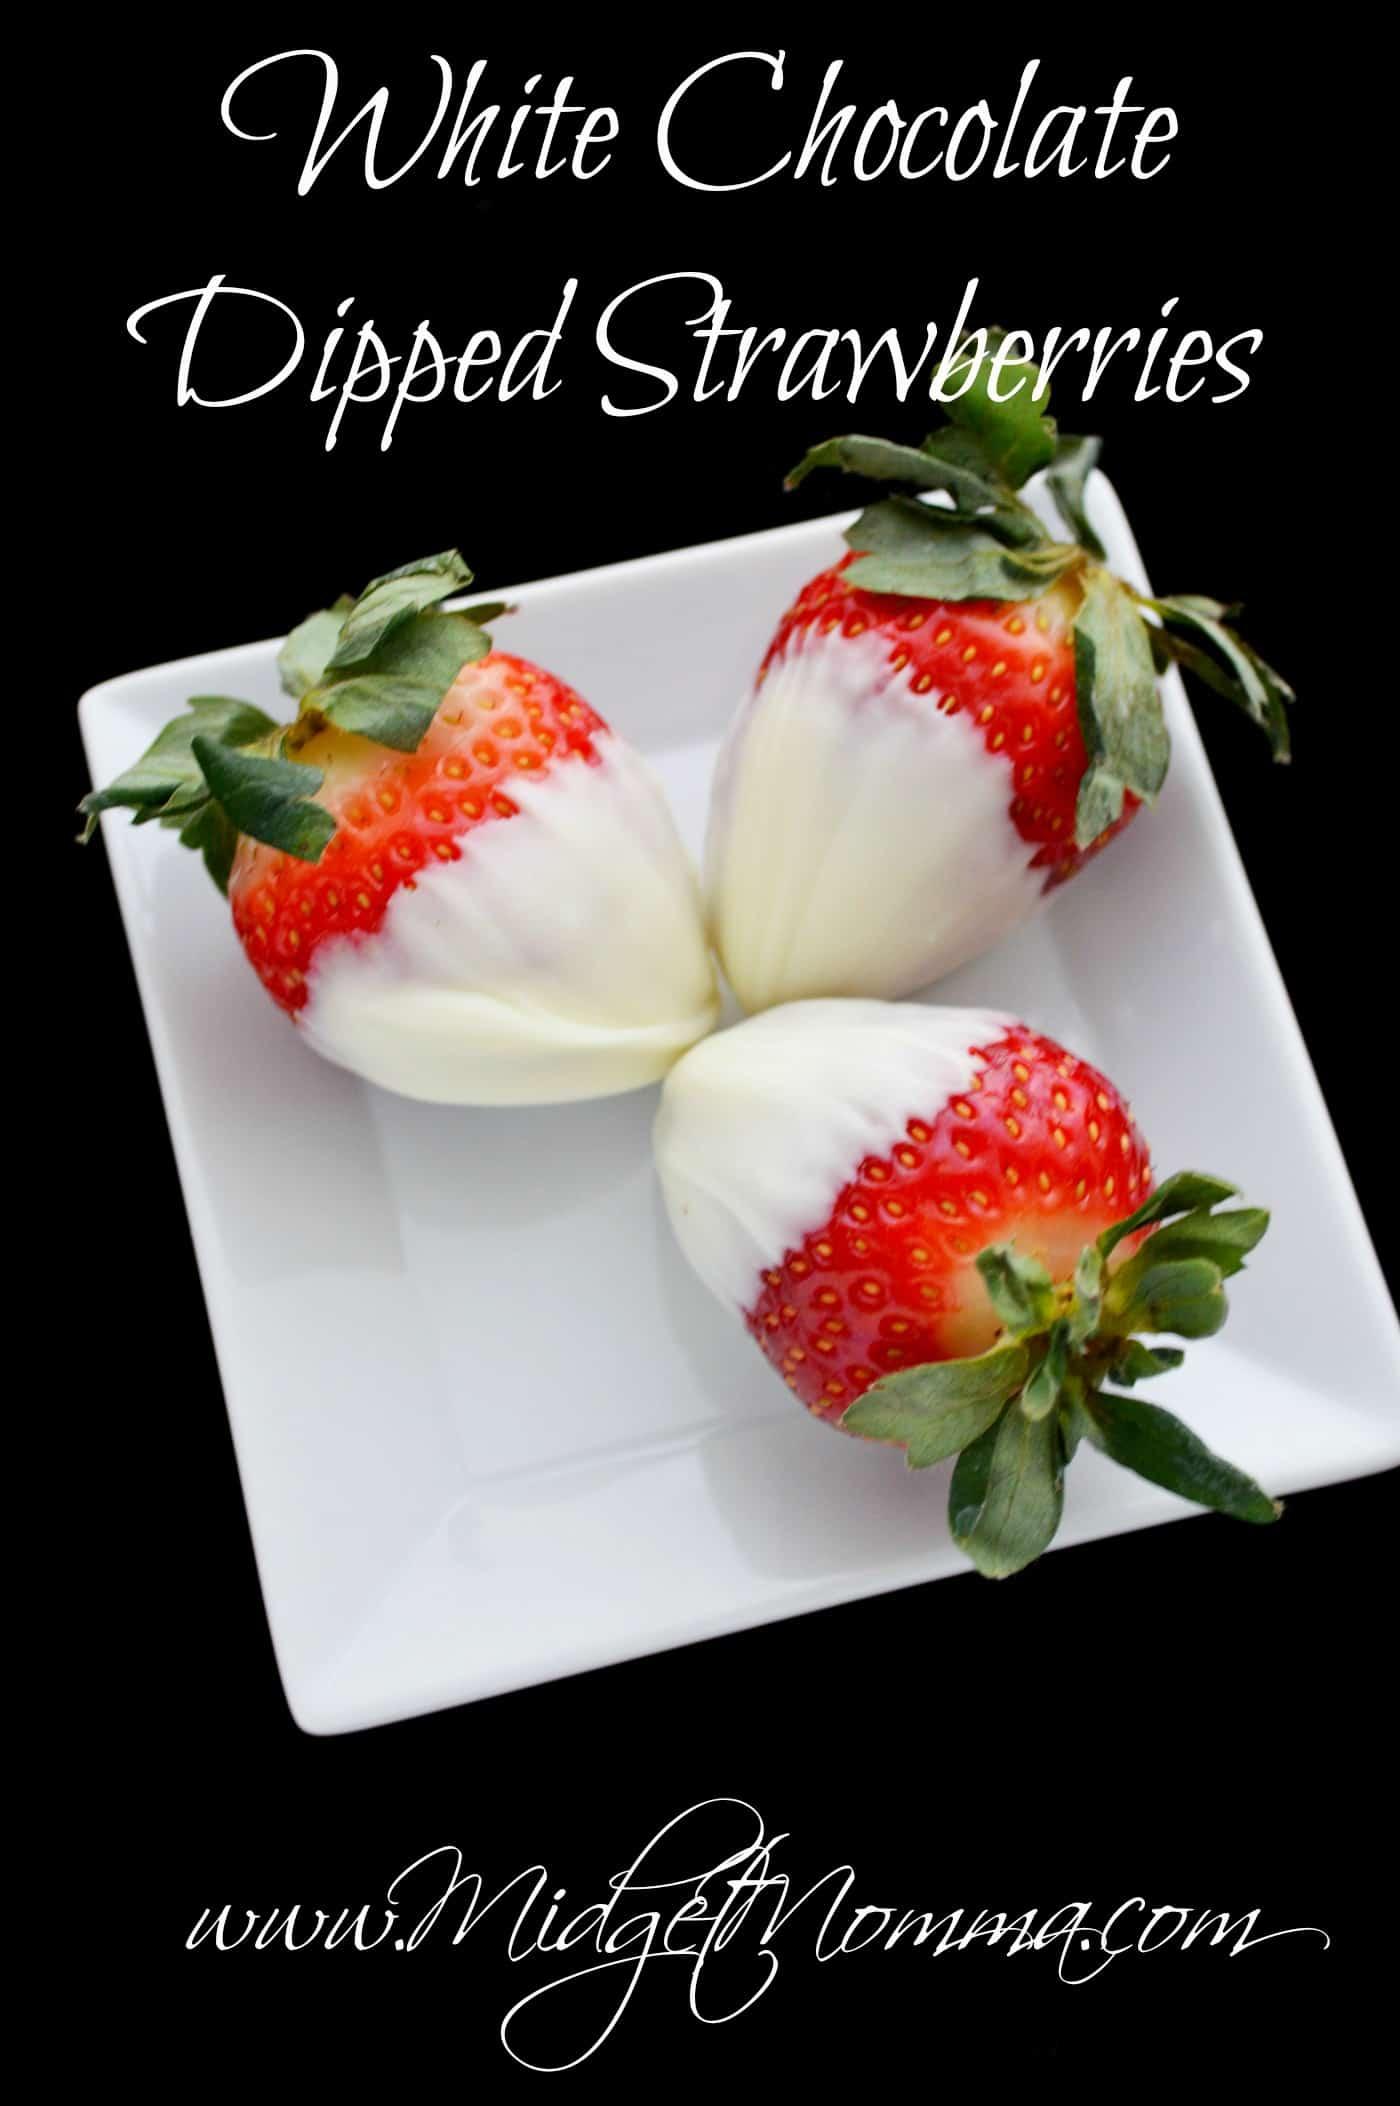 Classic White Chocolate Dipped Strawberries